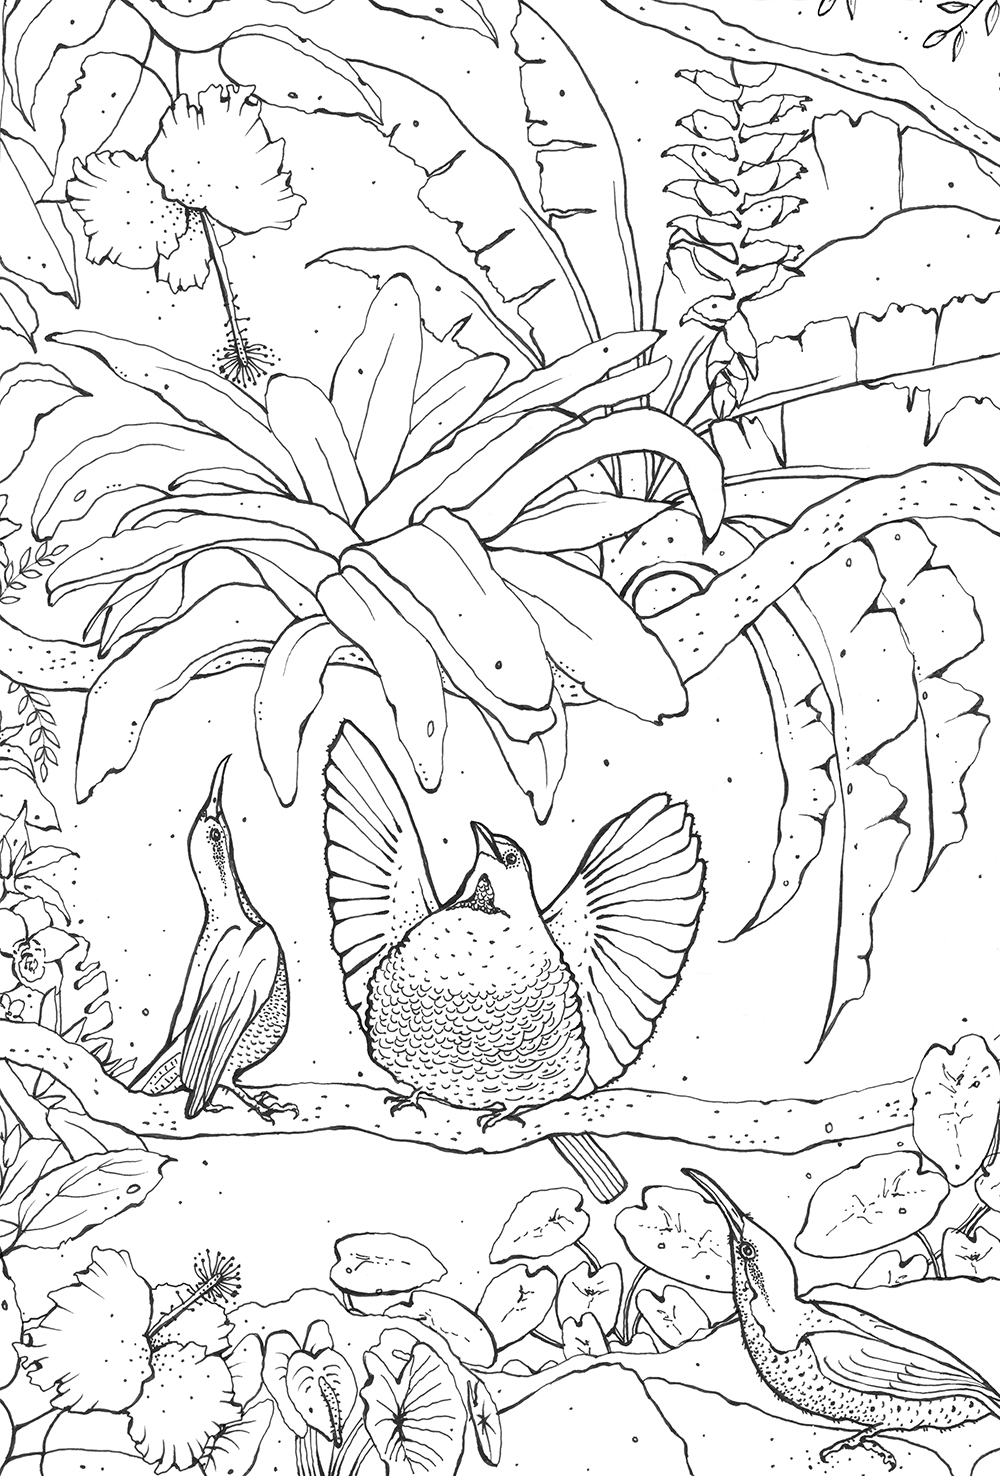 kerry lemon 'birds of paradise' colouring book